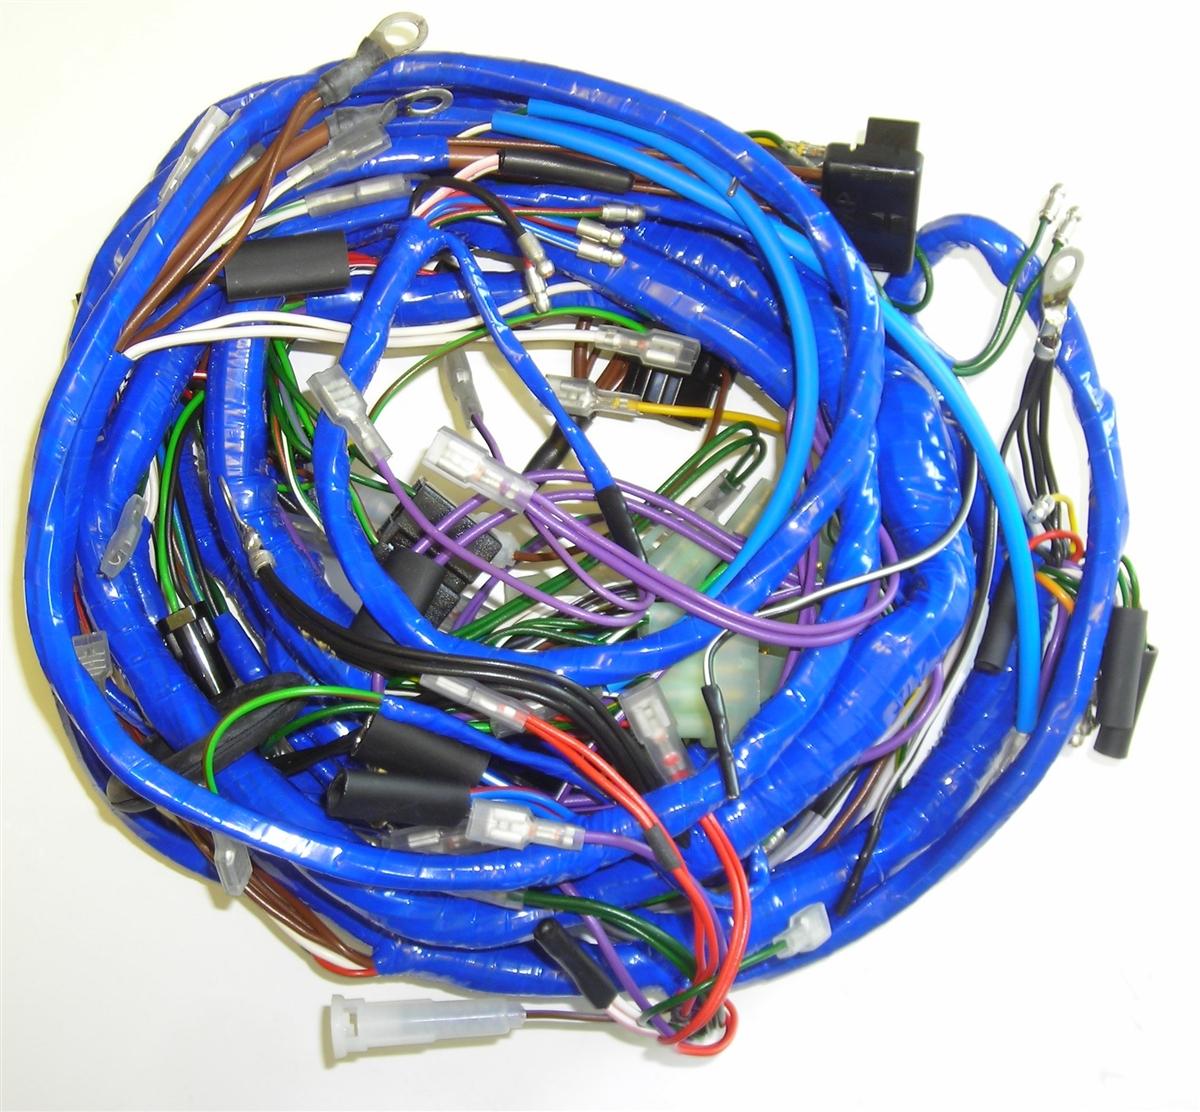 medium resolution of mgb 1974 main wiring harness 514 74 mgb wire harness